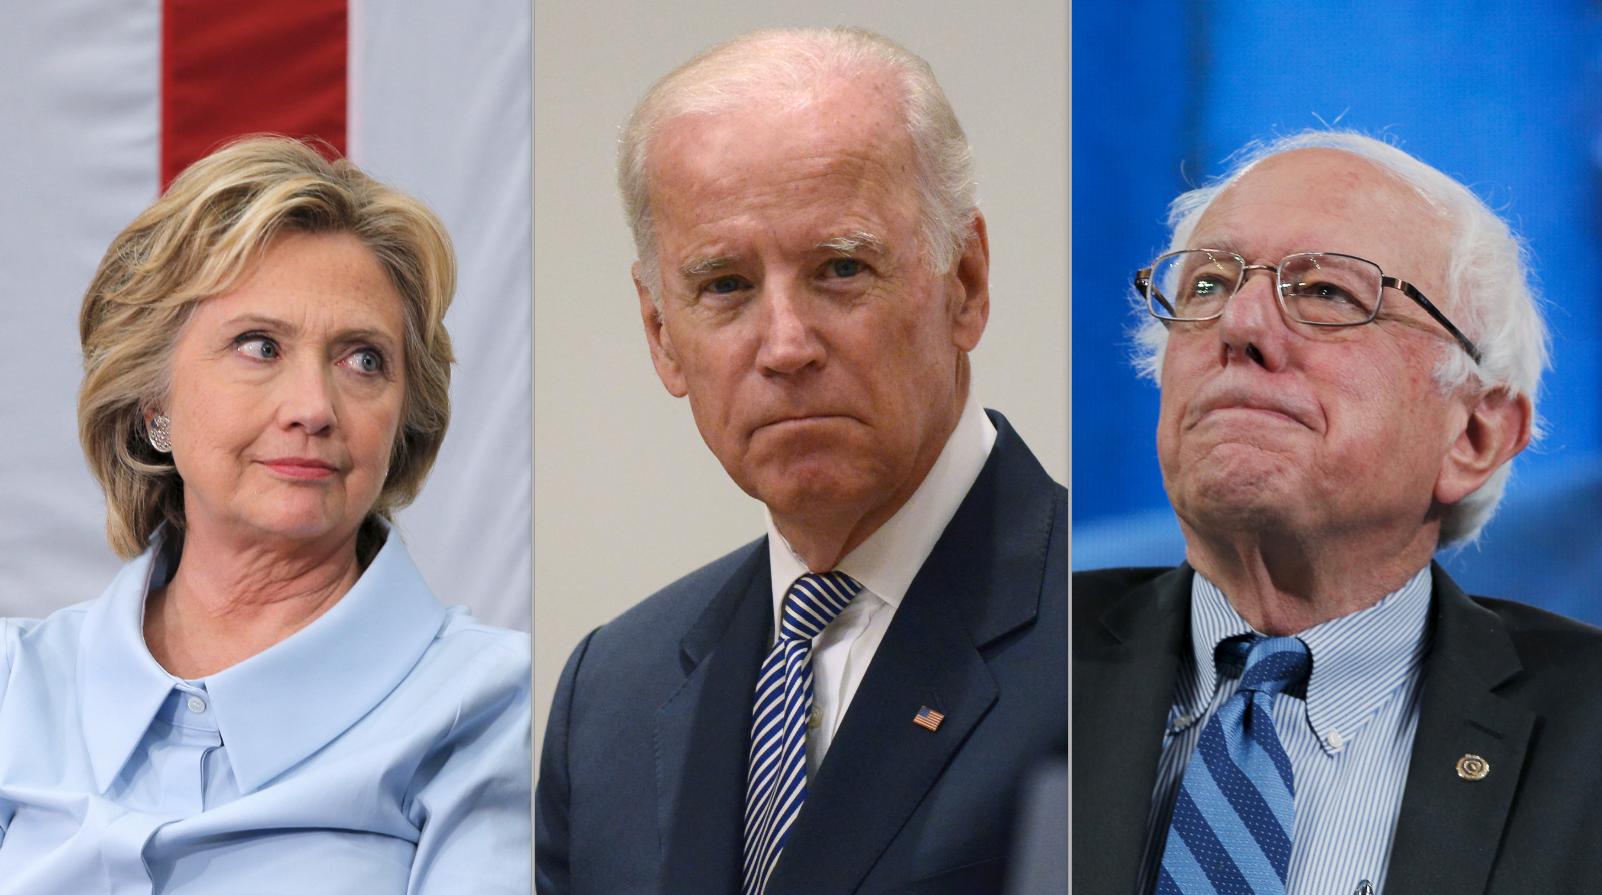 Vice President Joe Biden campaigns for Hillary Clinton in